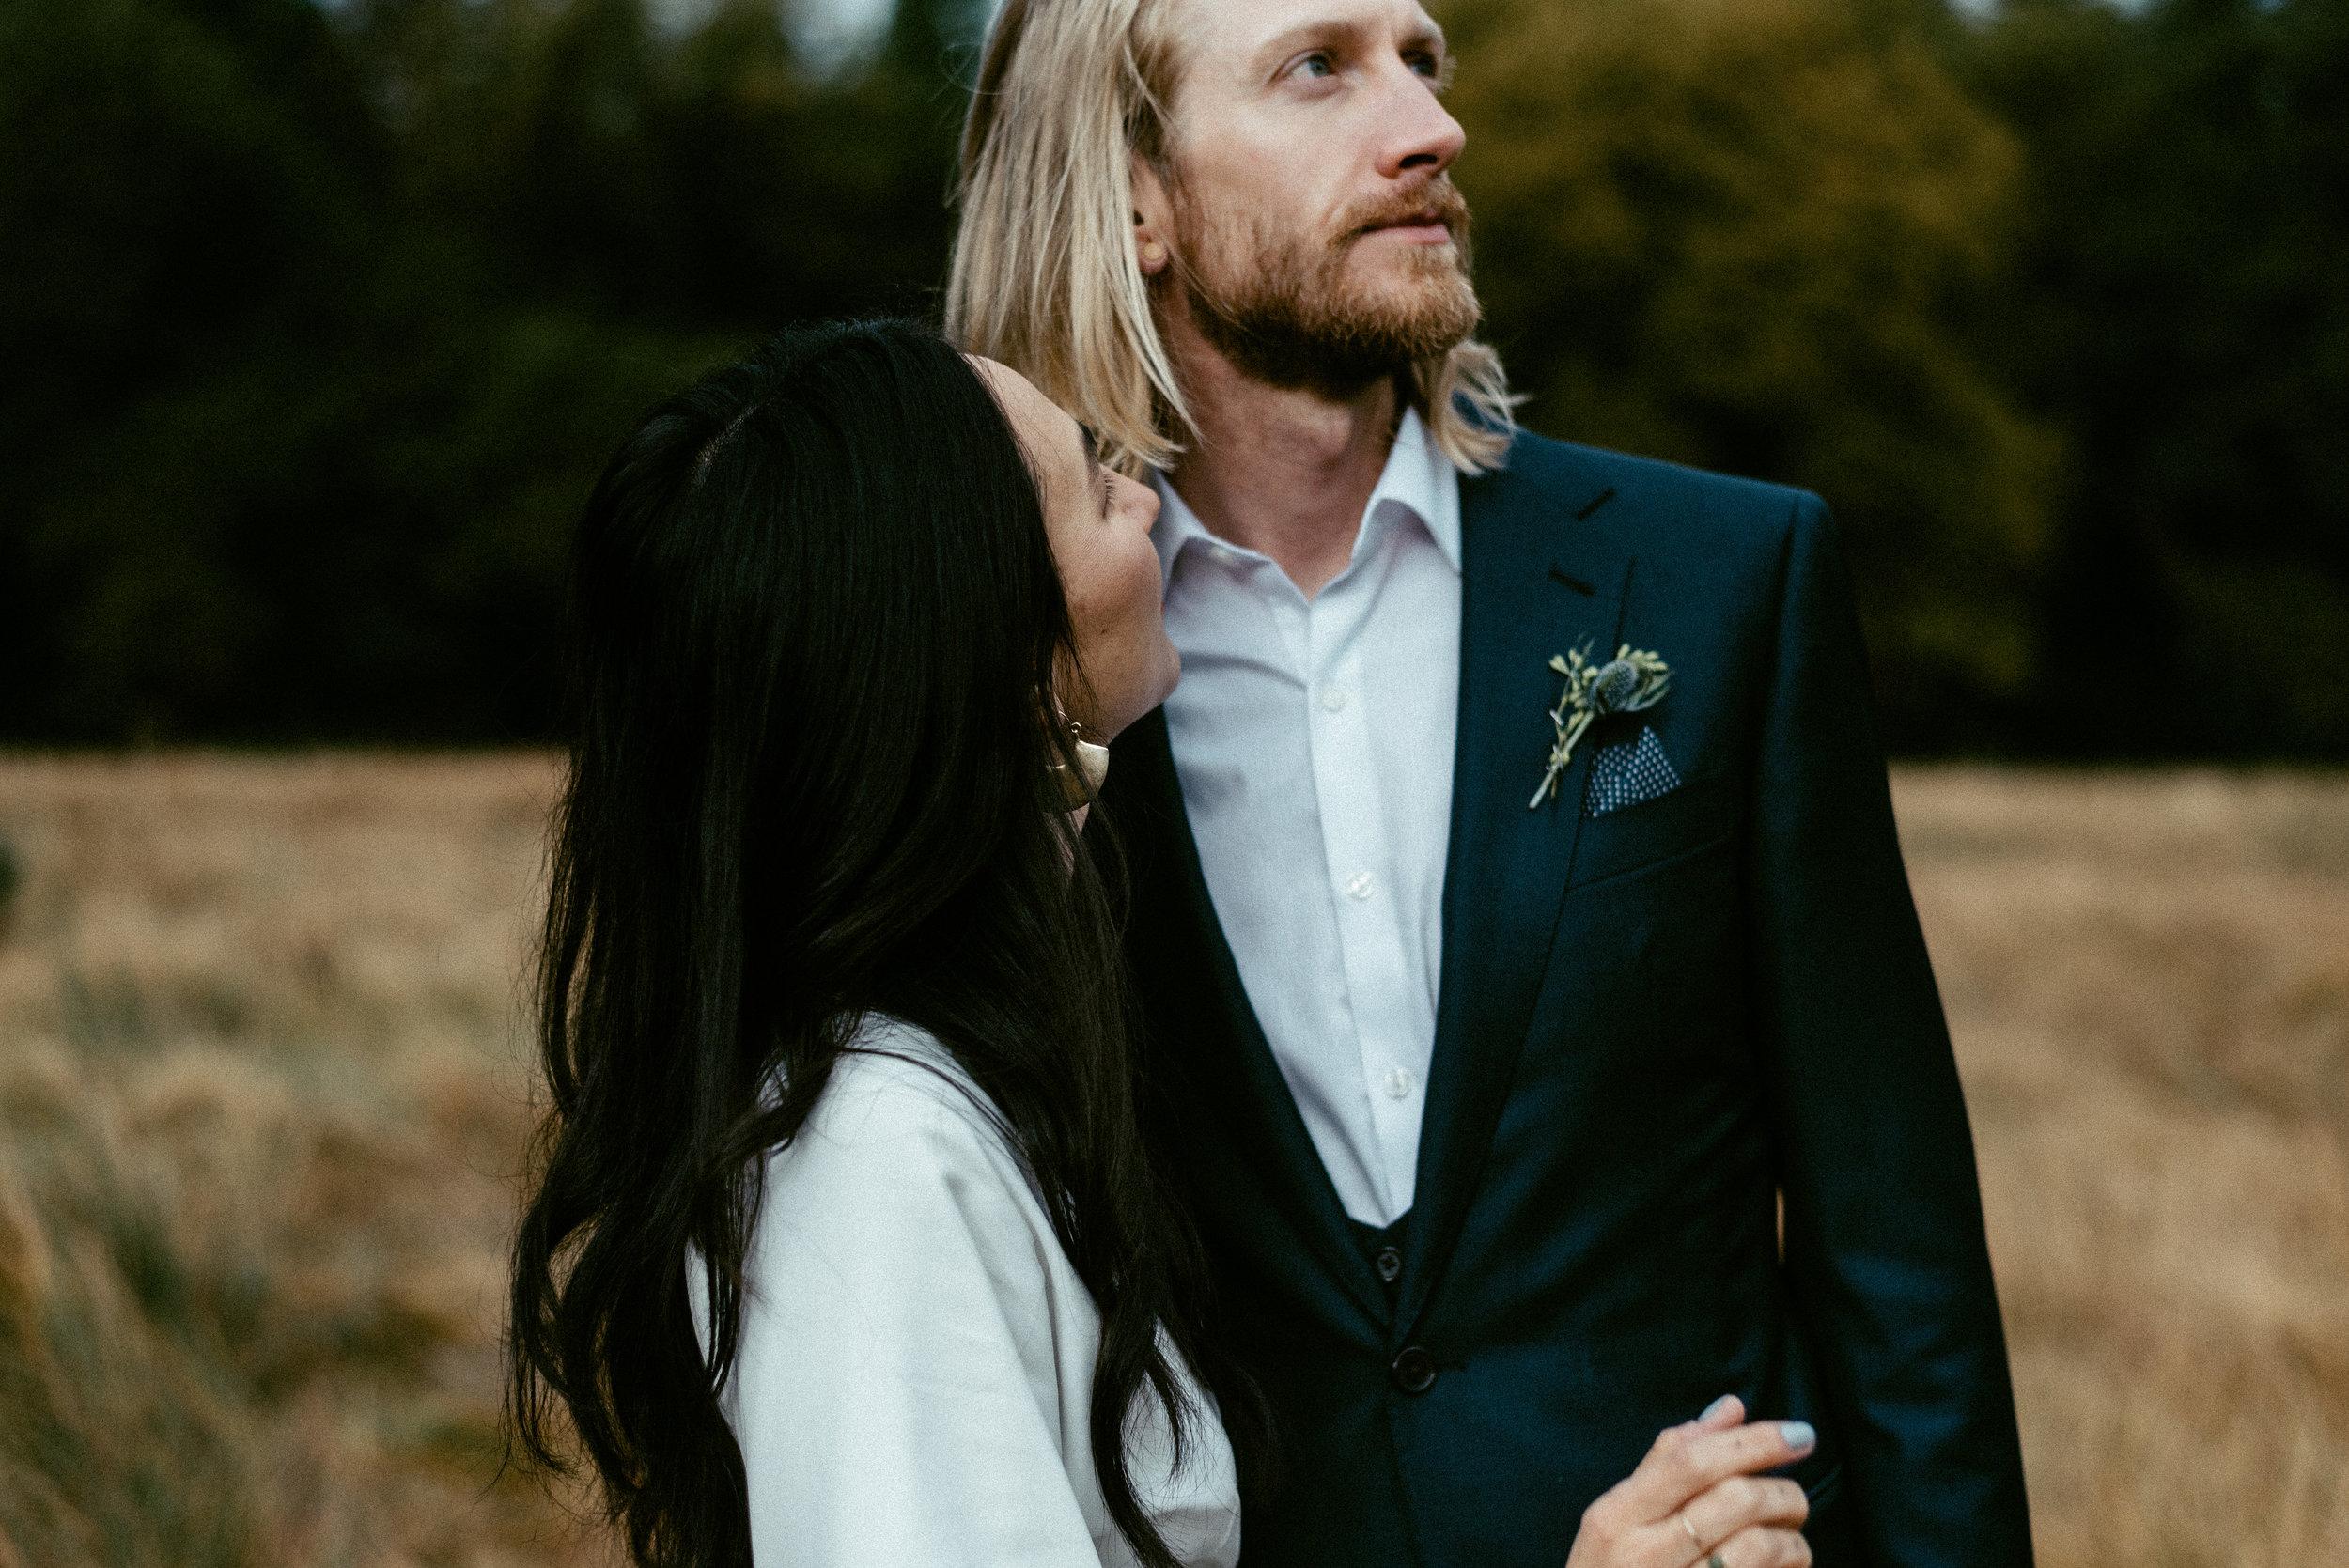 yosemite-wedding-dana-sean-86.jpg